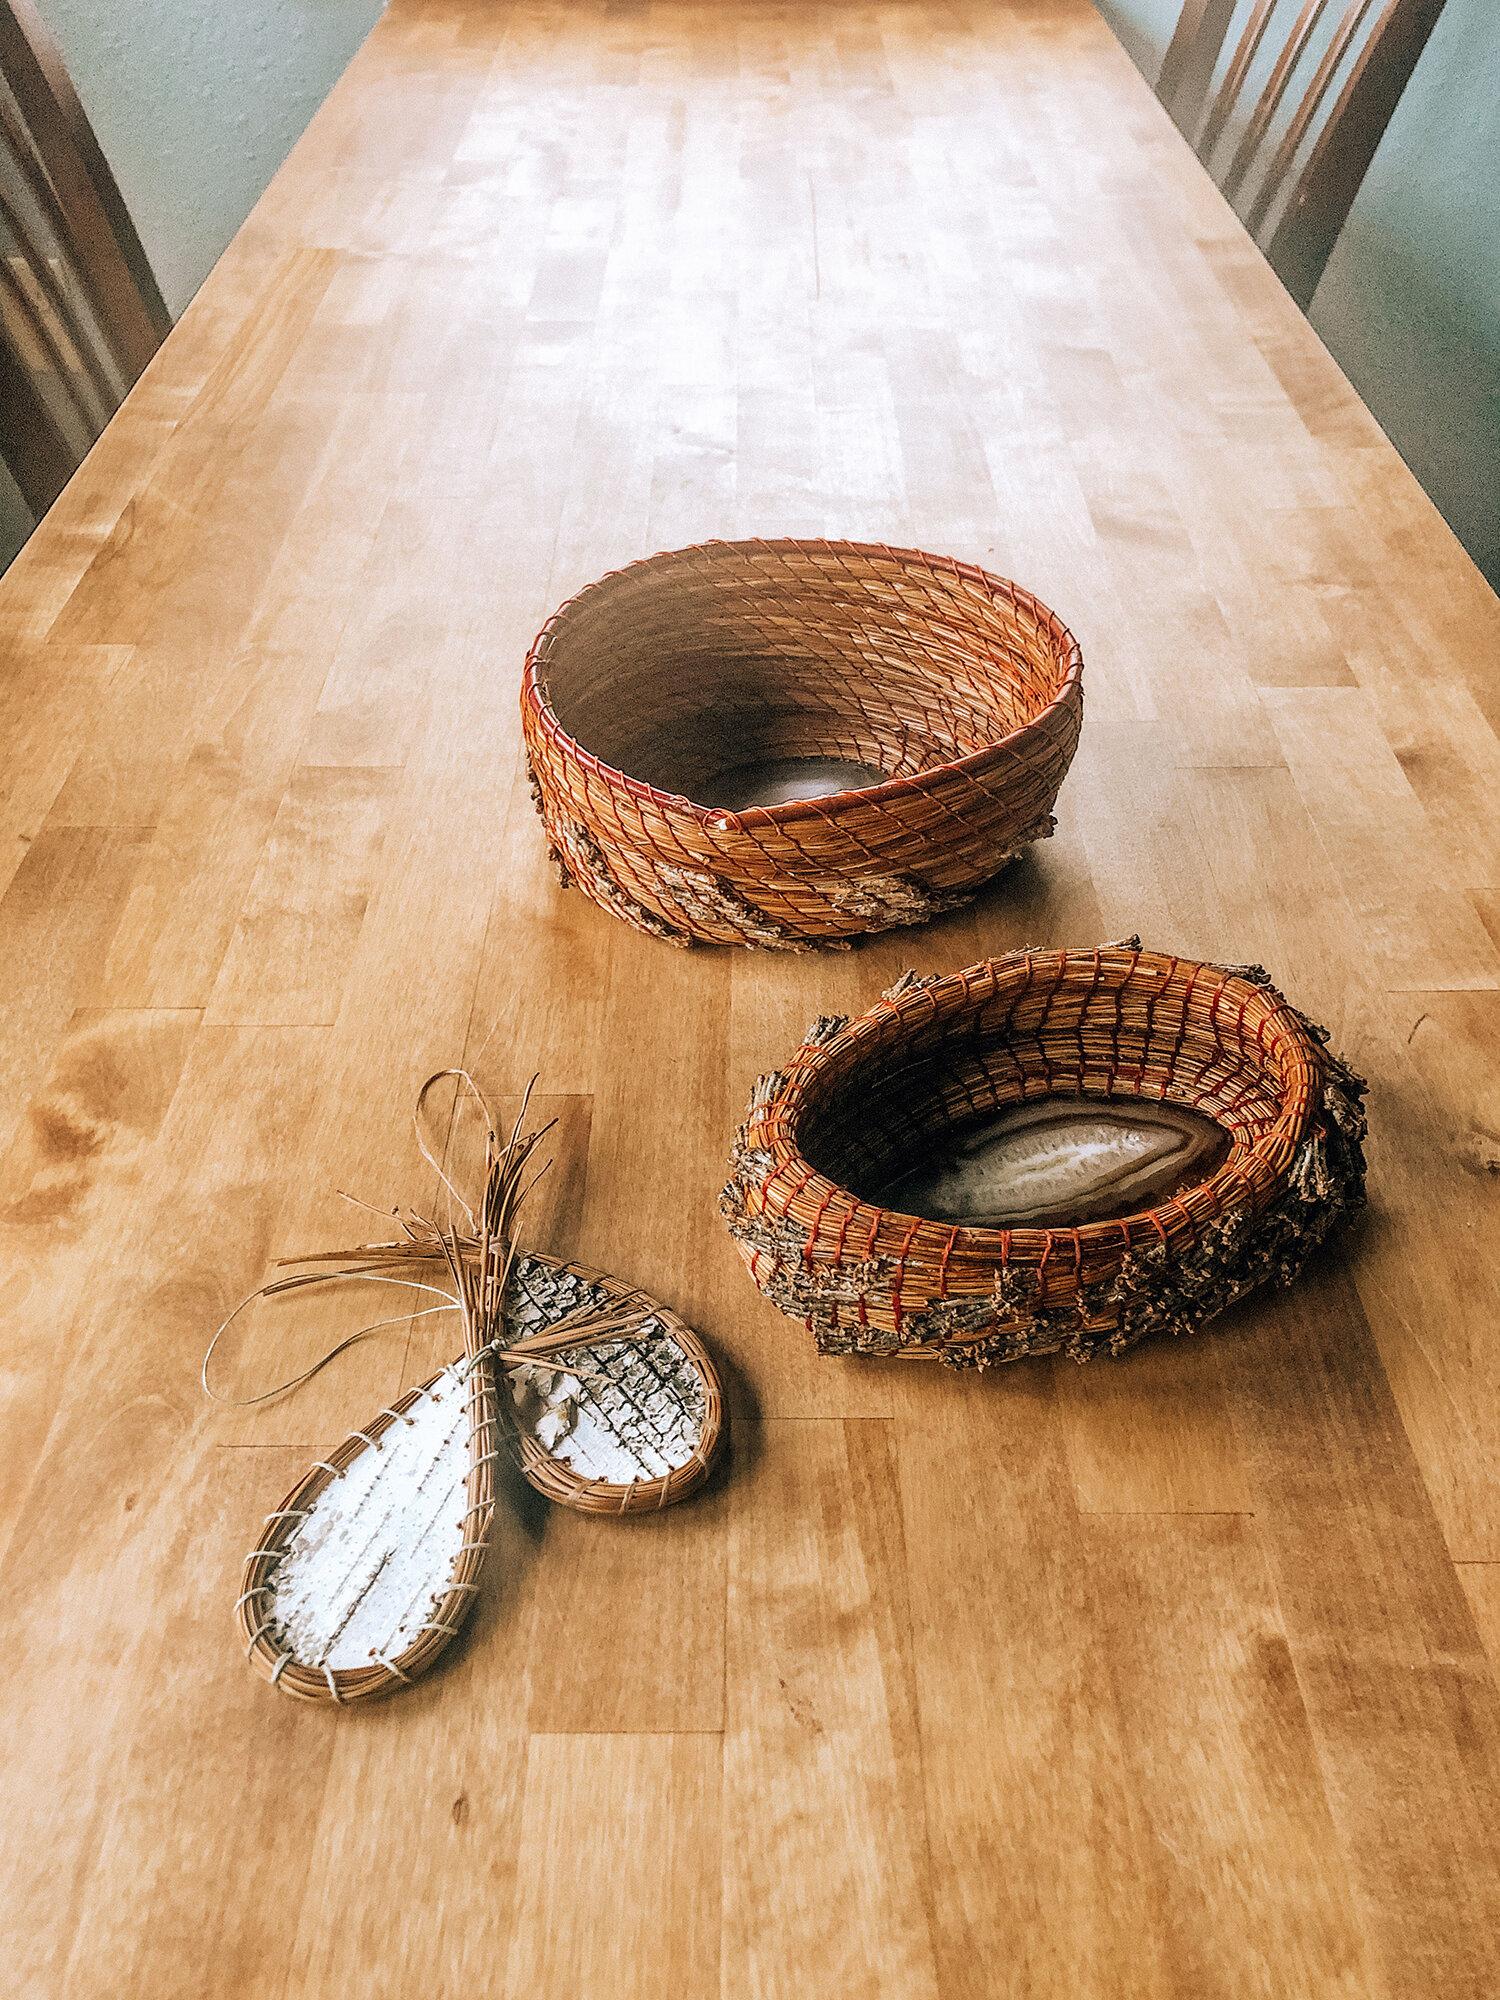 pine_needle_baskets.jpg